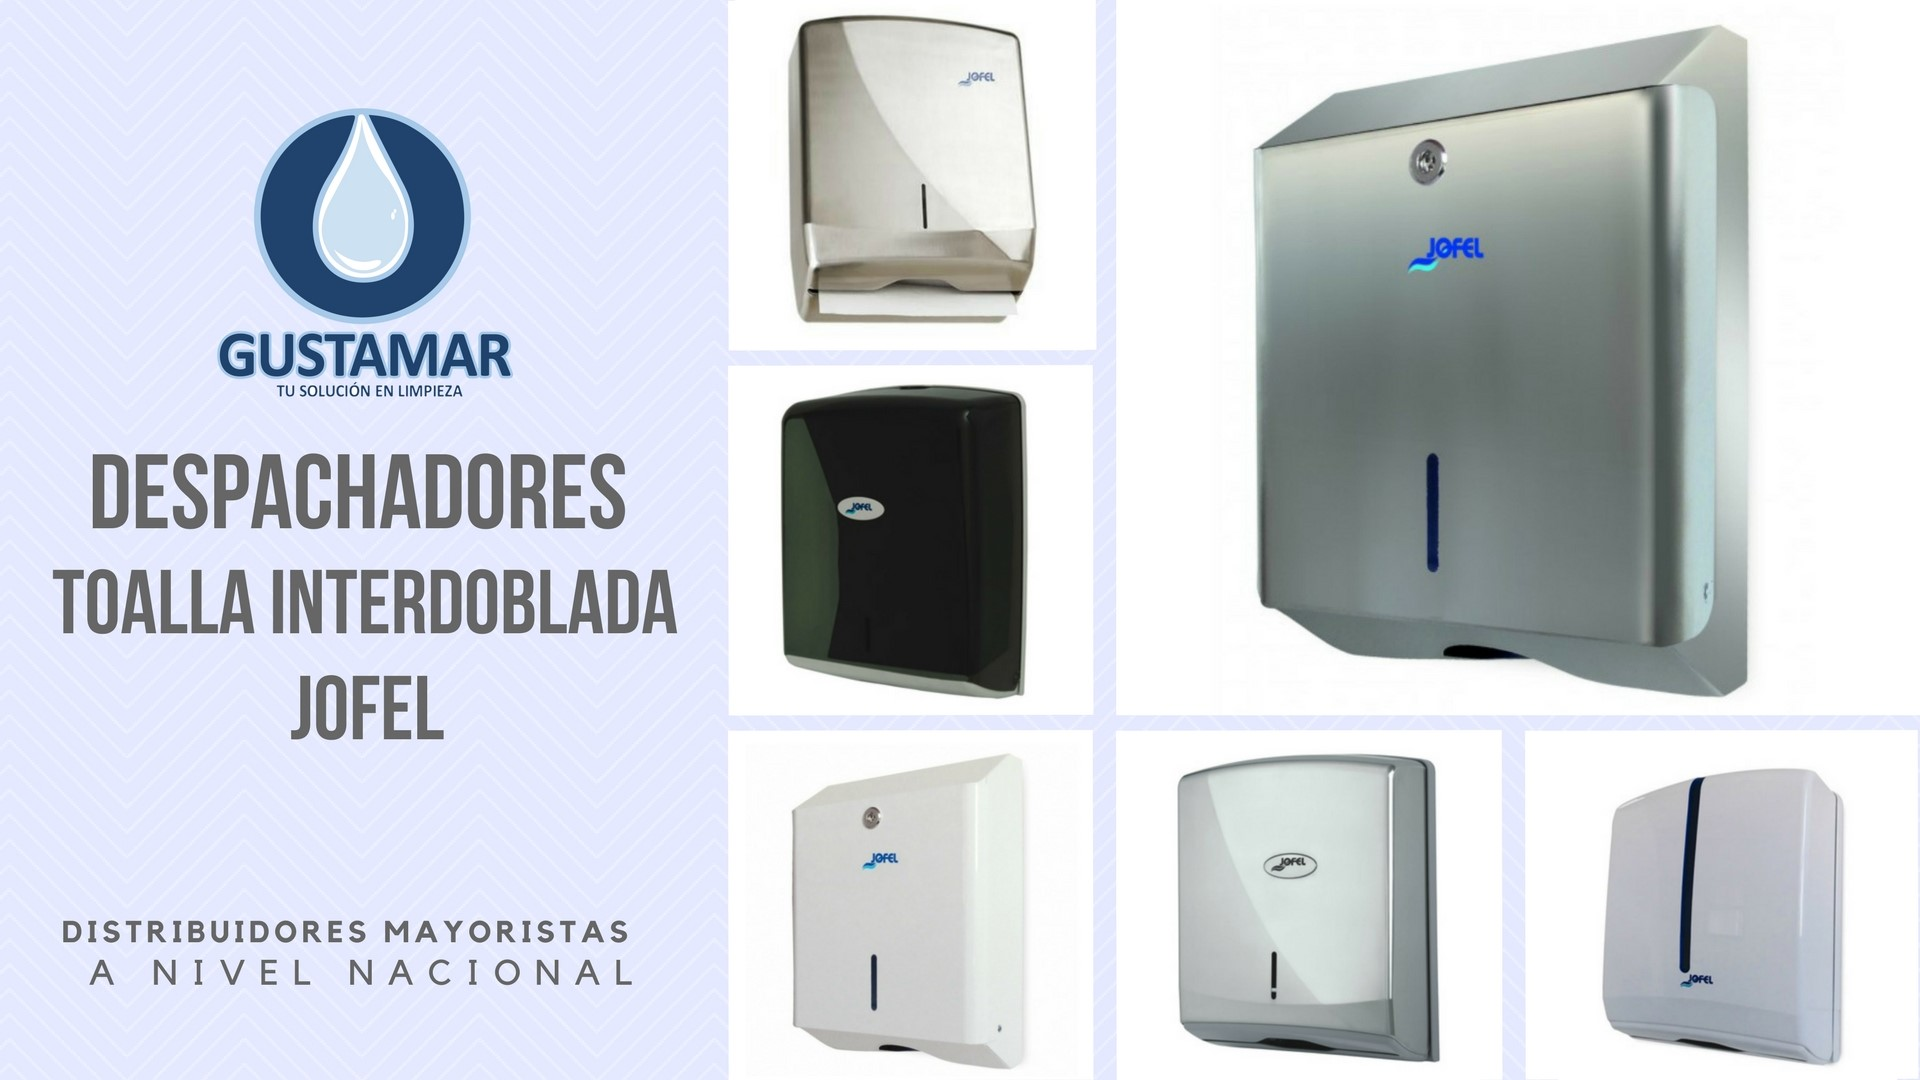 DESPACHADORES DE TOALLA INTERDOBLADA JOFEL